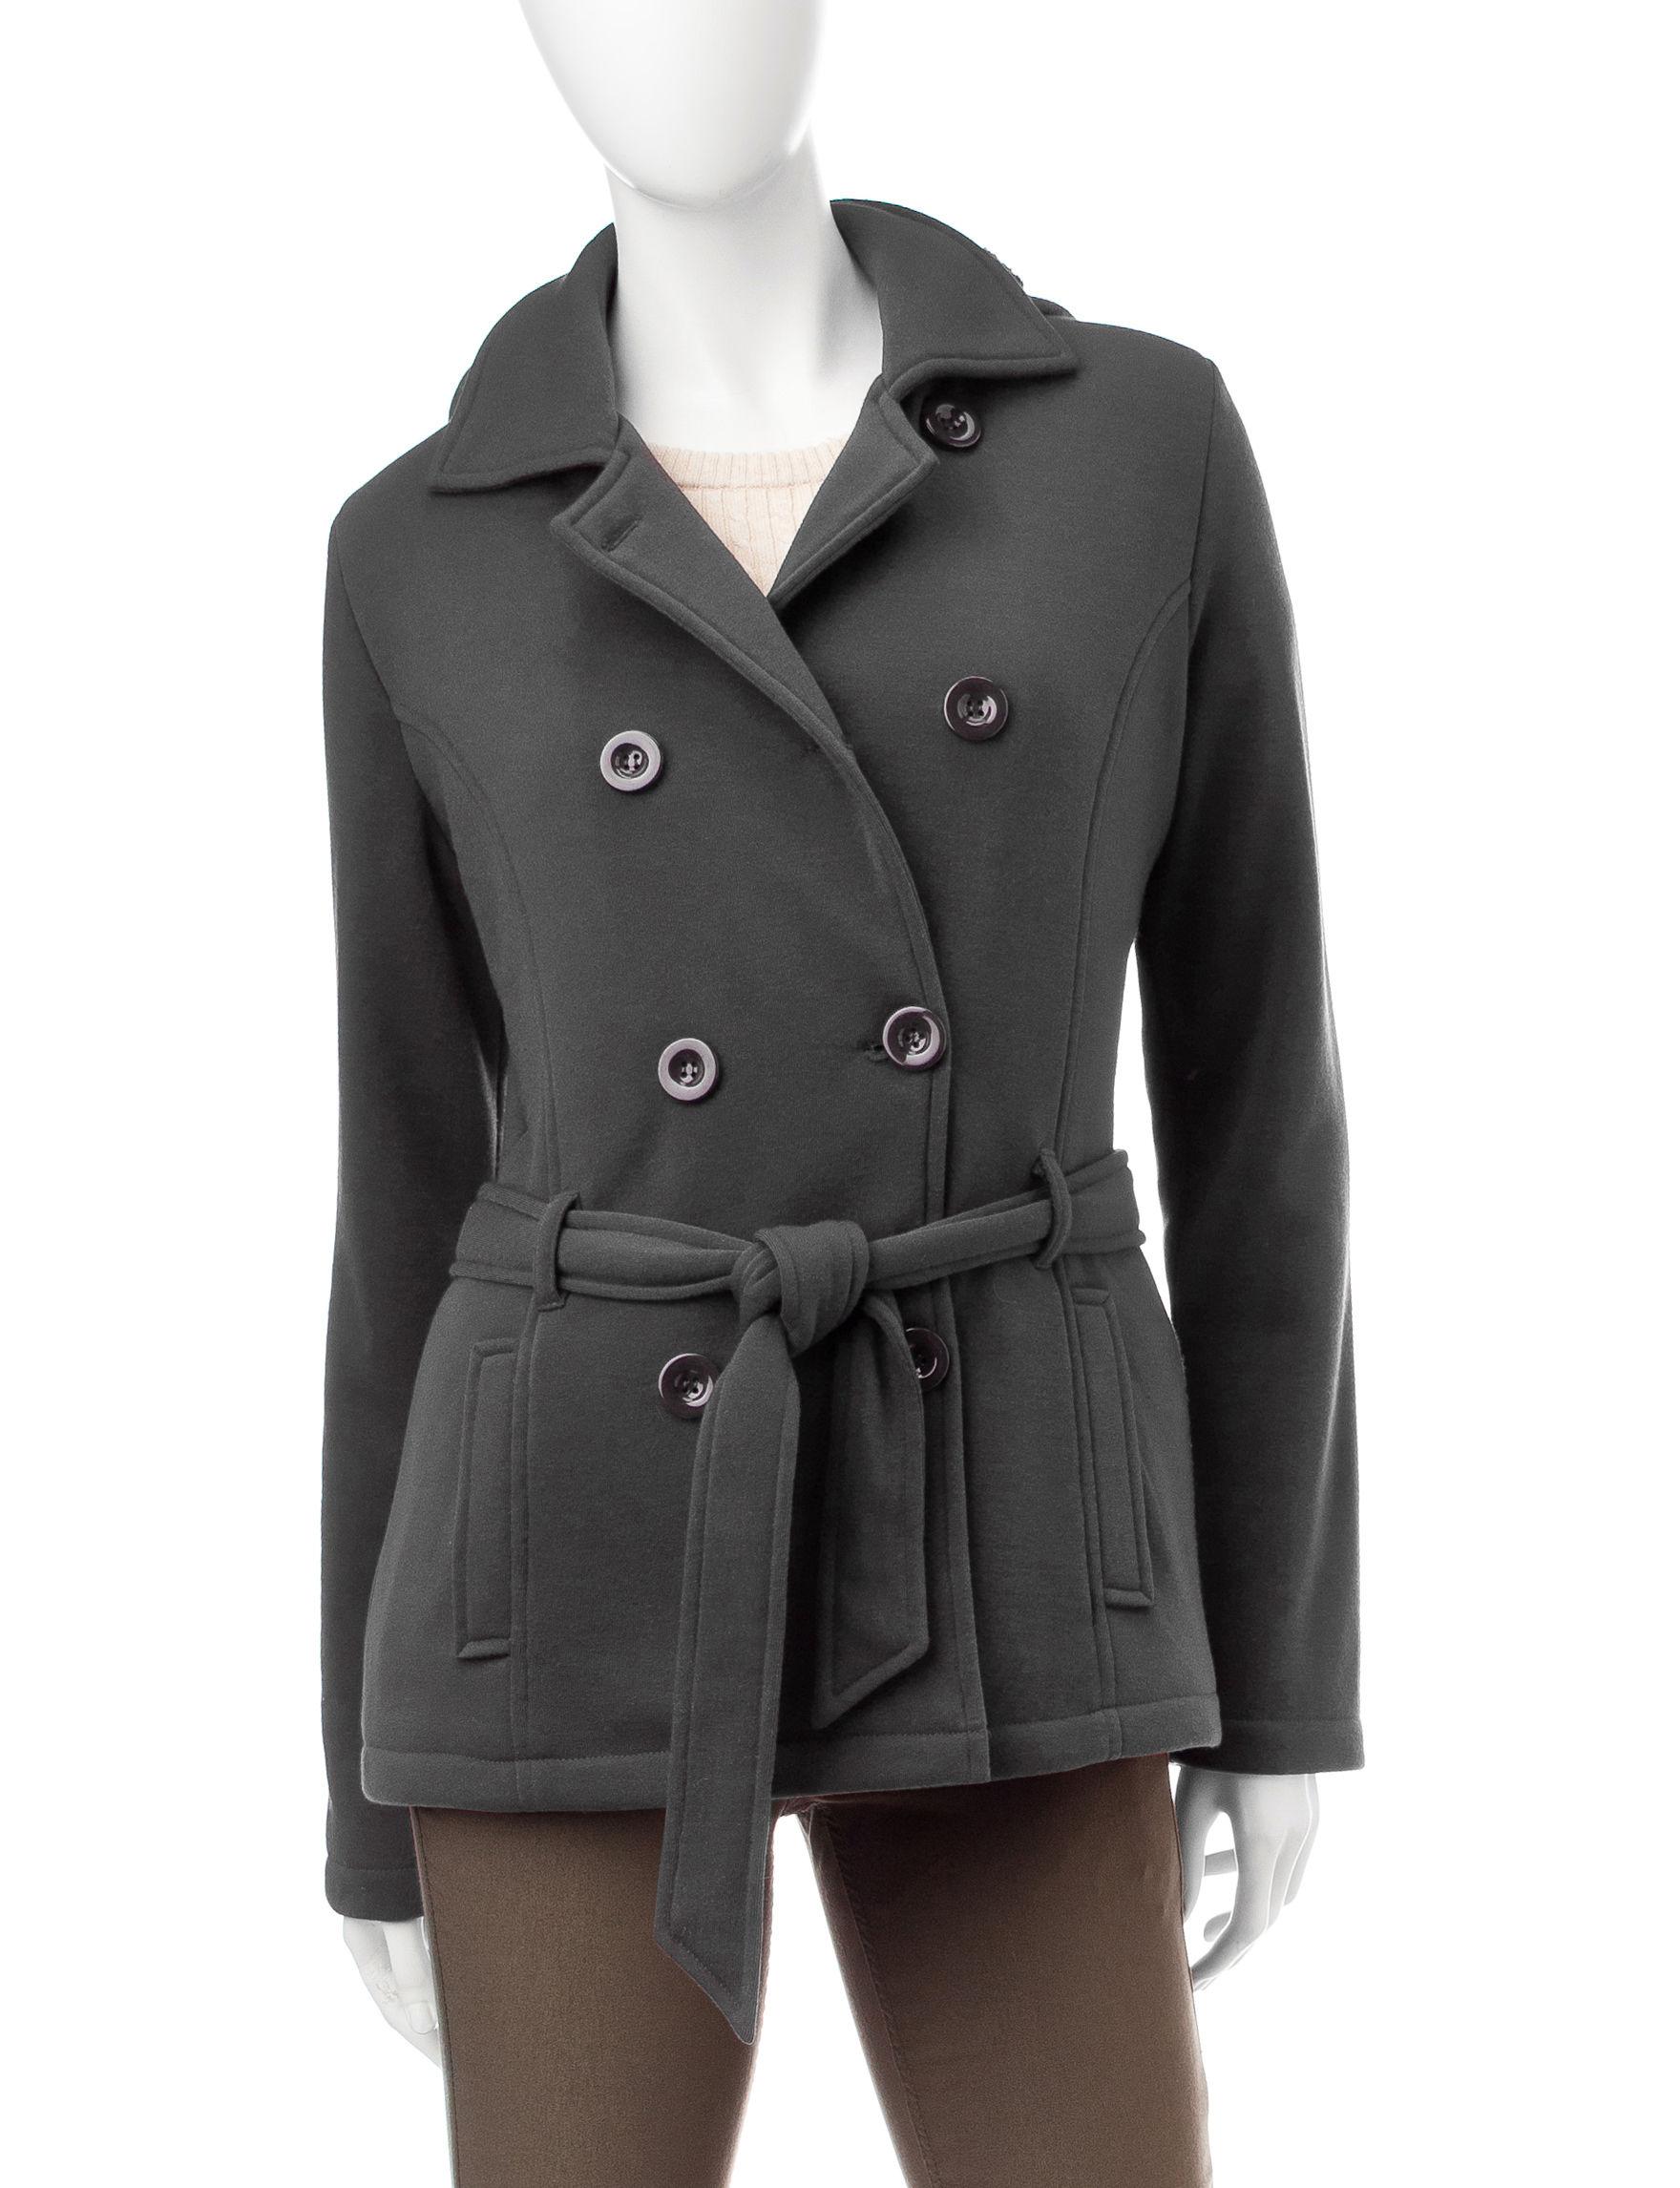 YMI Charcoal Fleece & Soft Shell Jackets